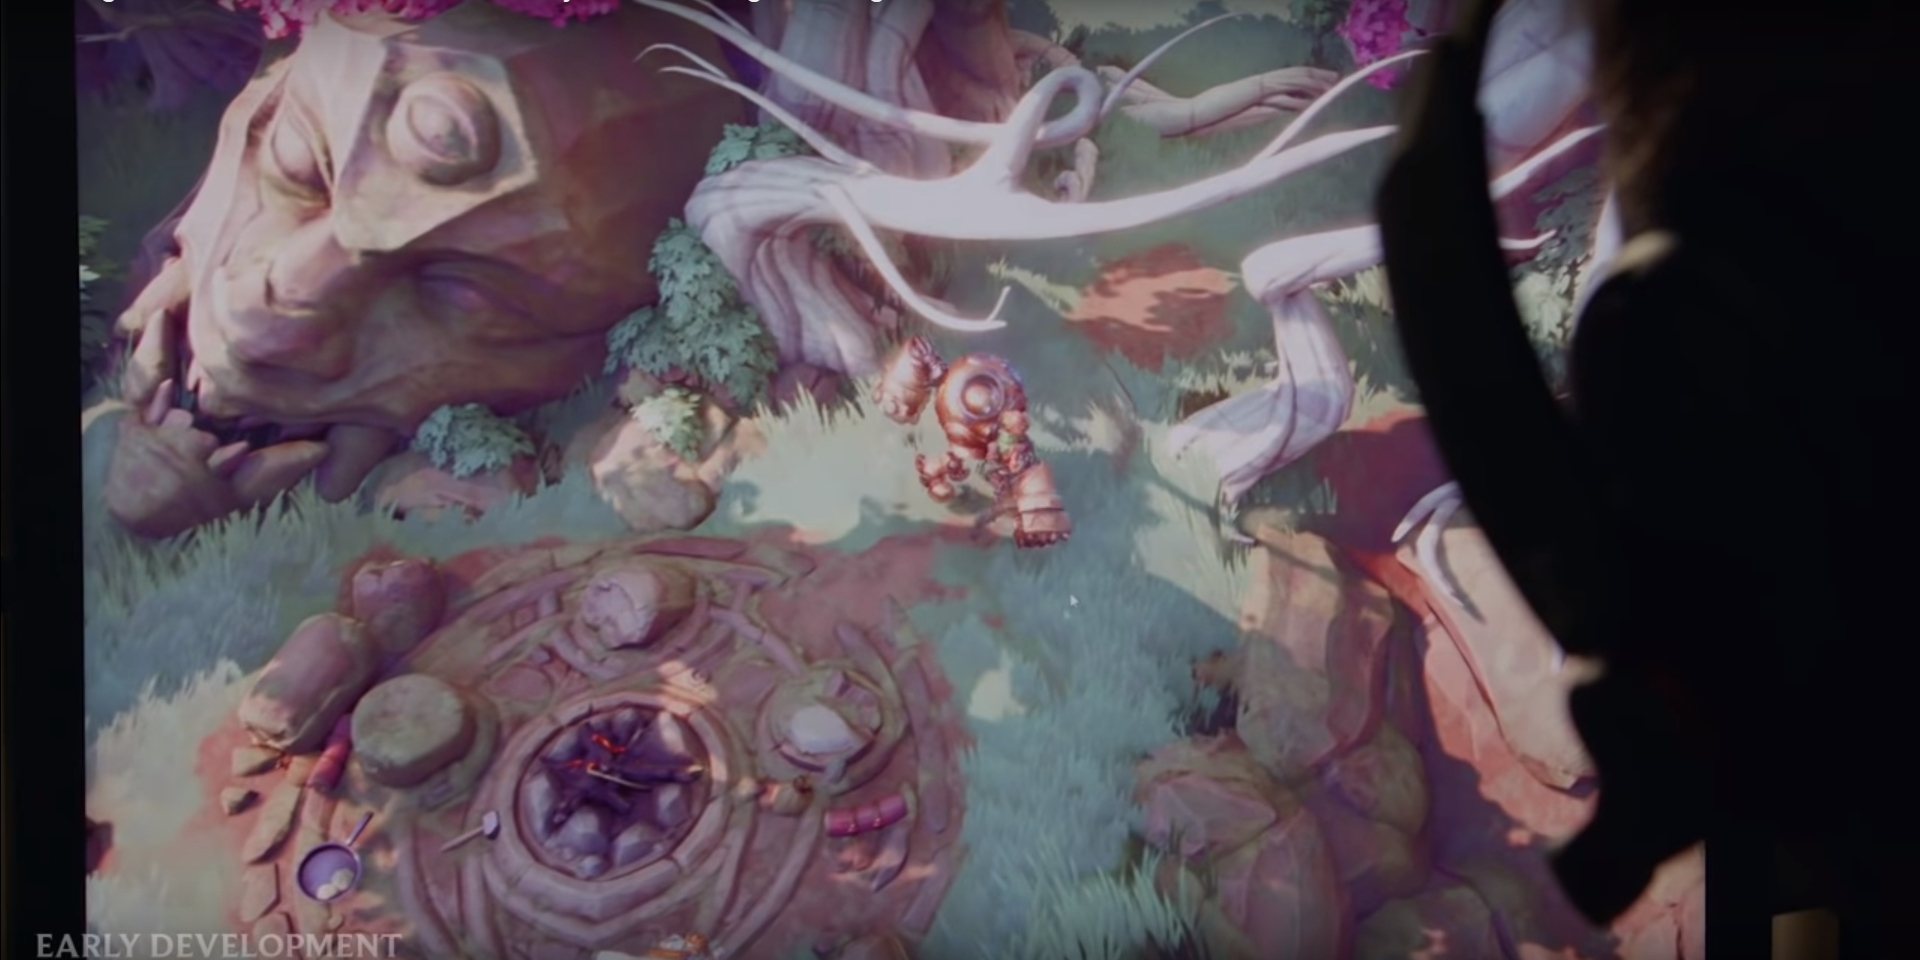 Una imagen de Project F, el futuro MMOARPG de Riot Games. Fuente: https://www.youtube.com/watch?v=WRf9tnWk2sg